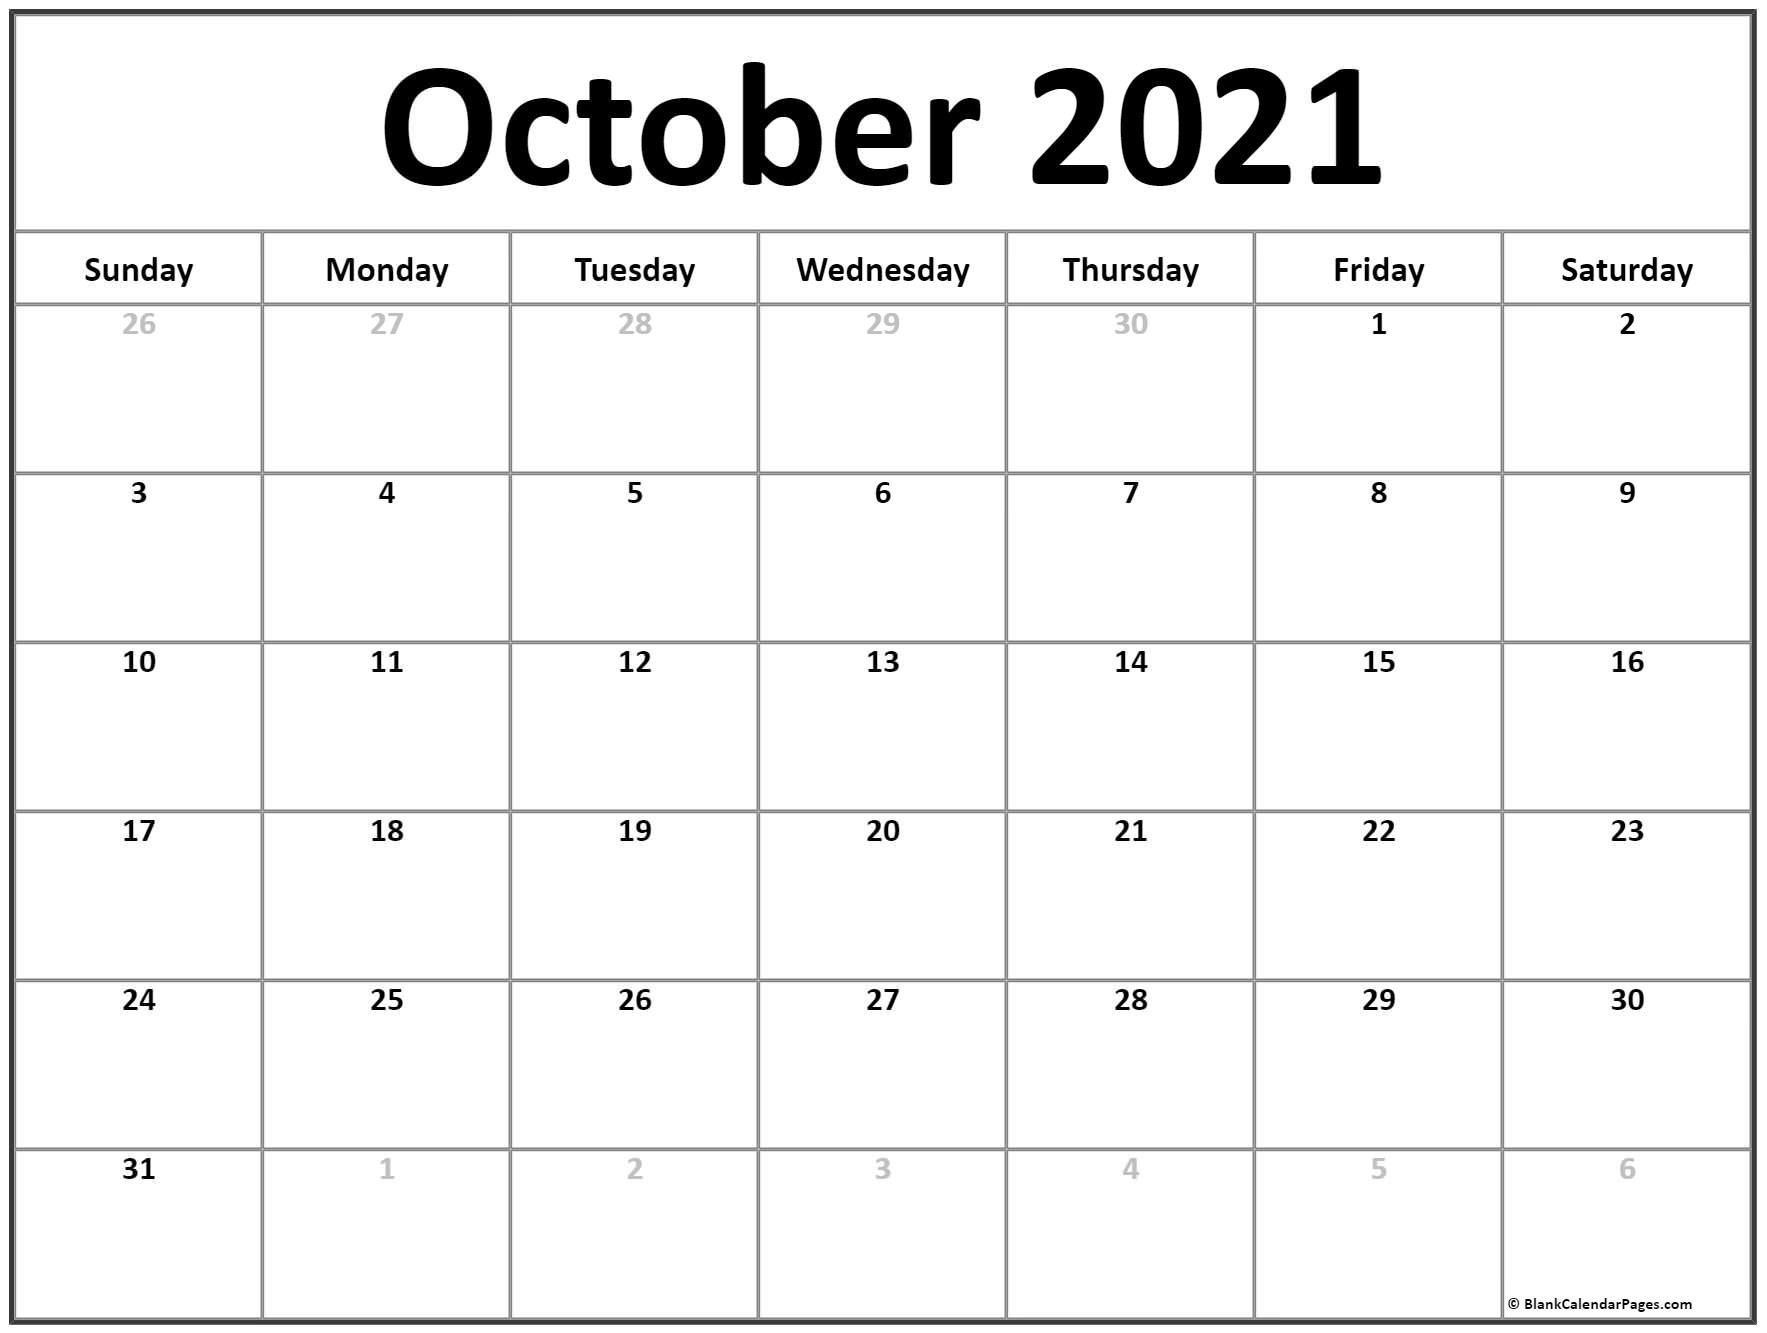 Printable Blank Monthly Calendar 2021 With Lines   Ten Free Printable Calendar 2020-2021 October 2020 To January 2021 Calendar